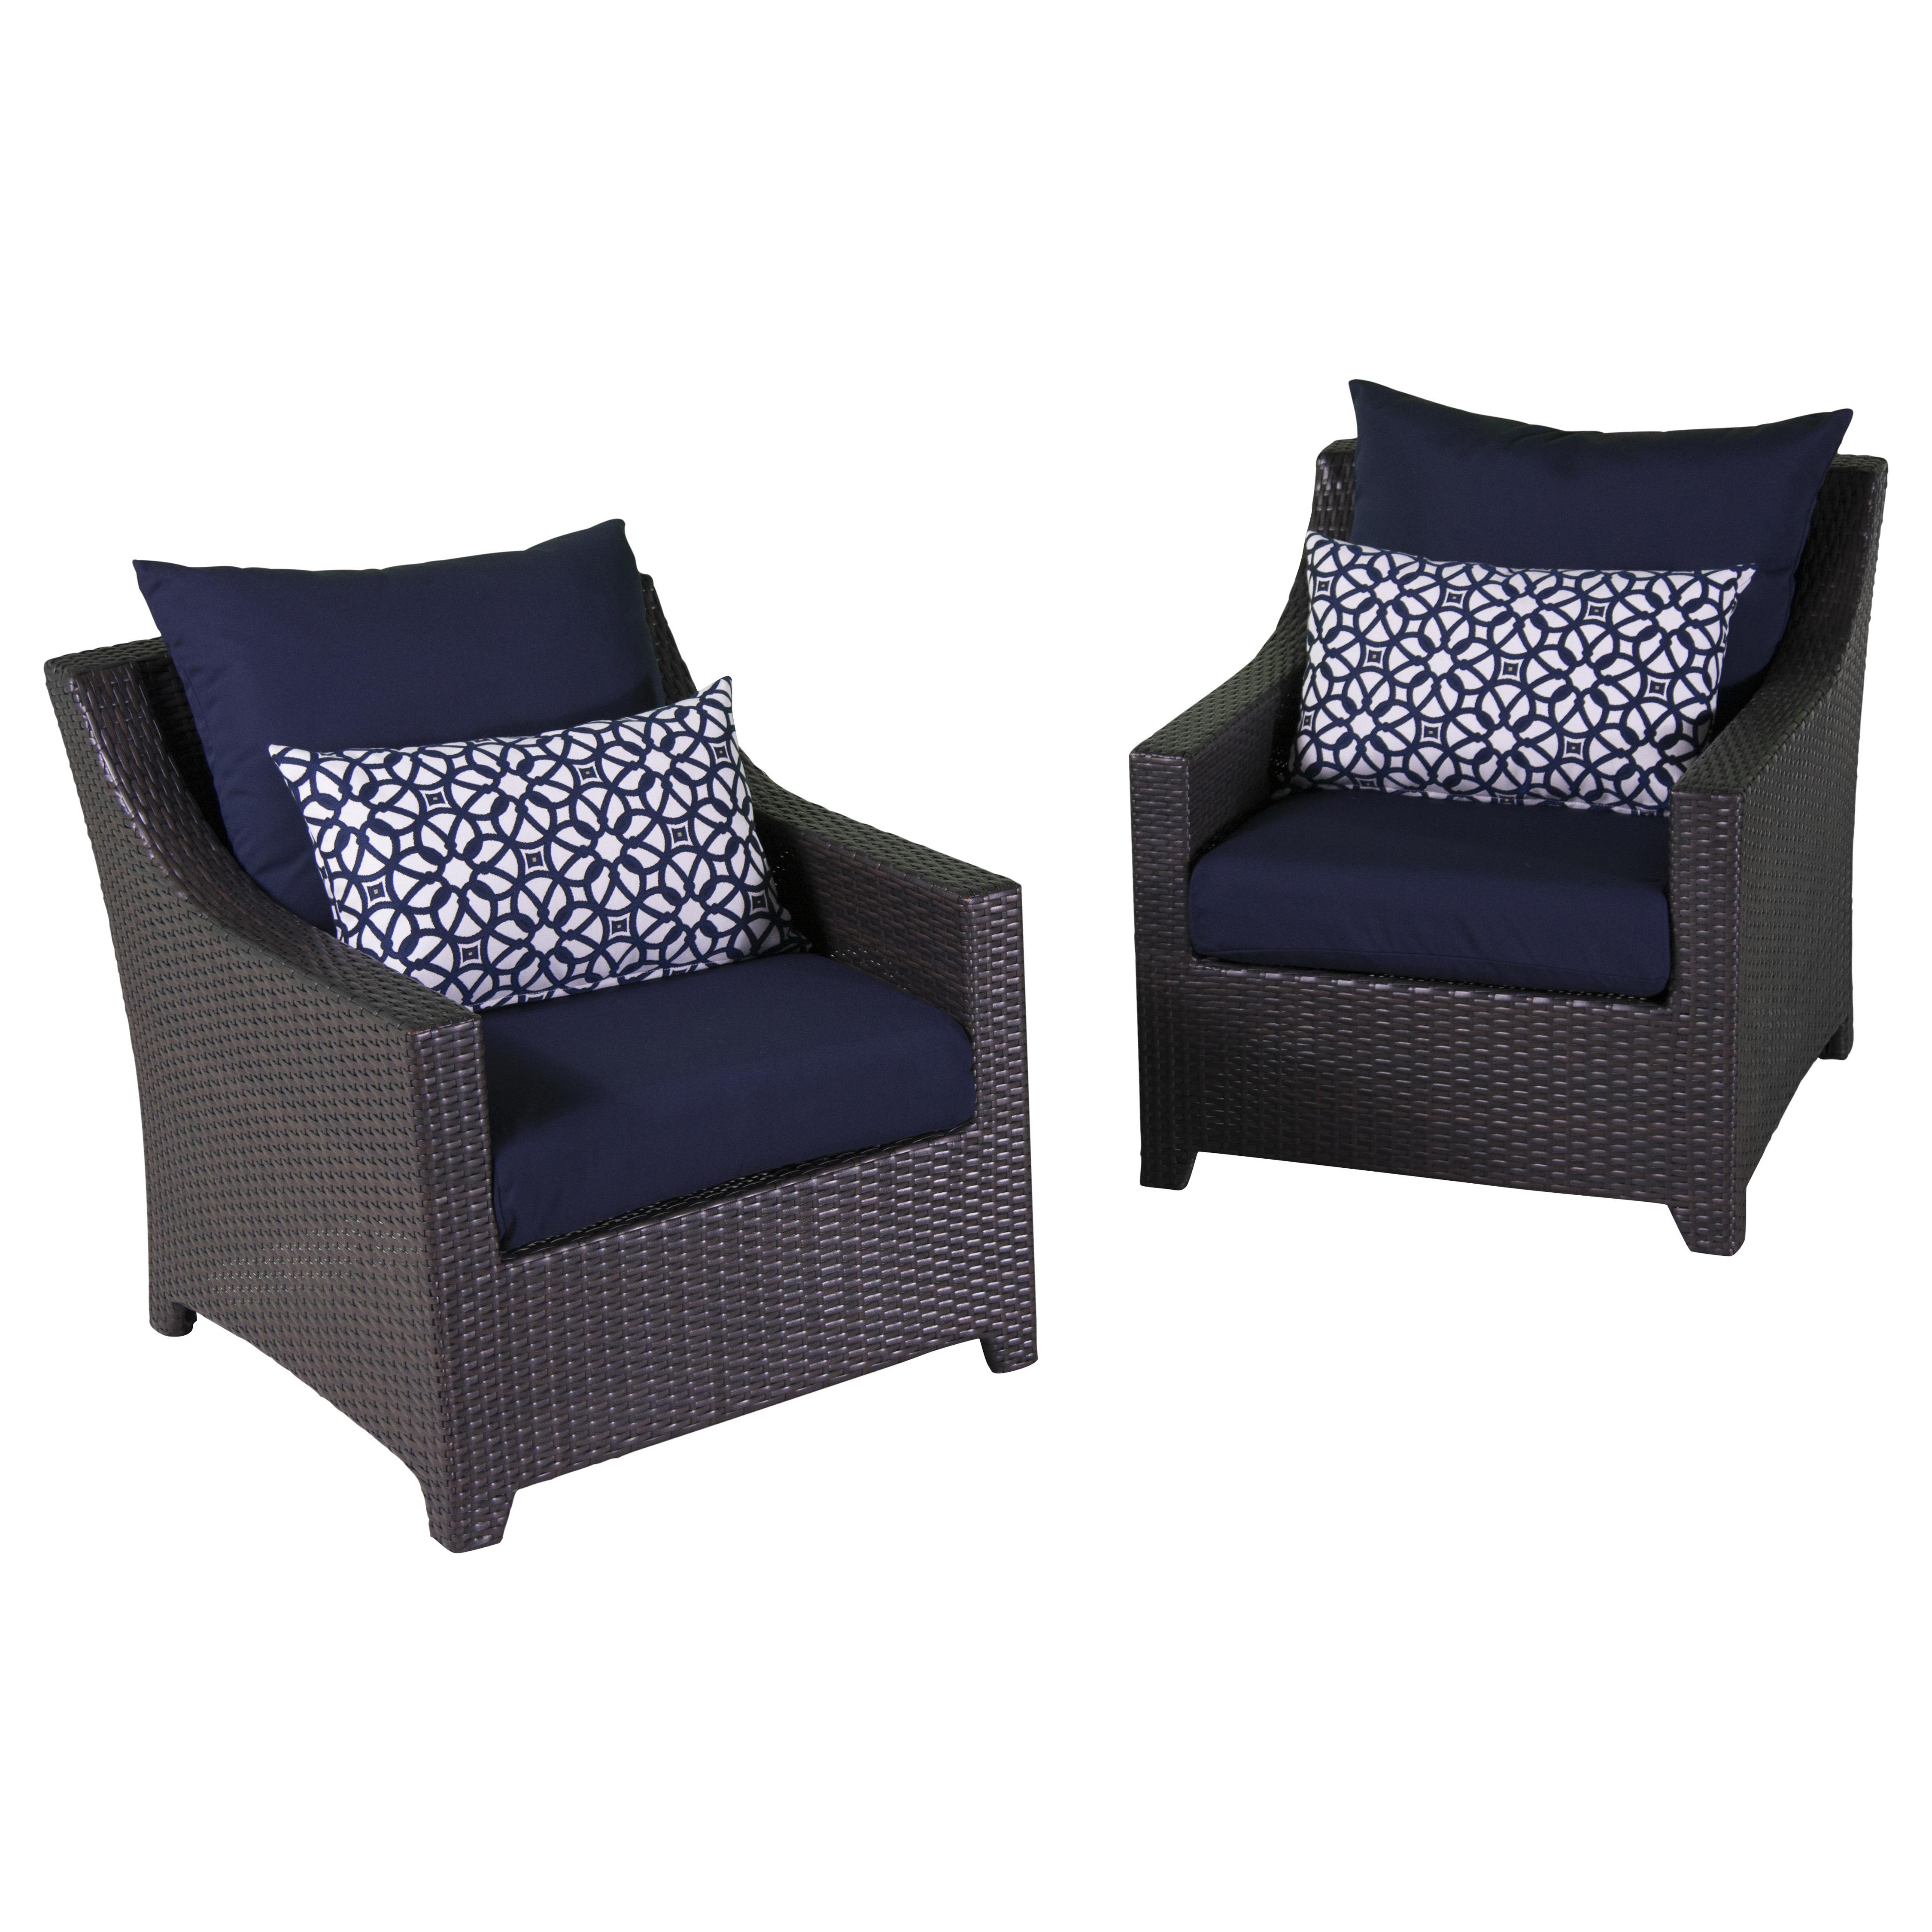 Most Popular Three Posts Northridge Patio Sofa With Sunbrella Cushions In Northridge Patio Sofas With Sunbrella Cushions (View 5 of 20)